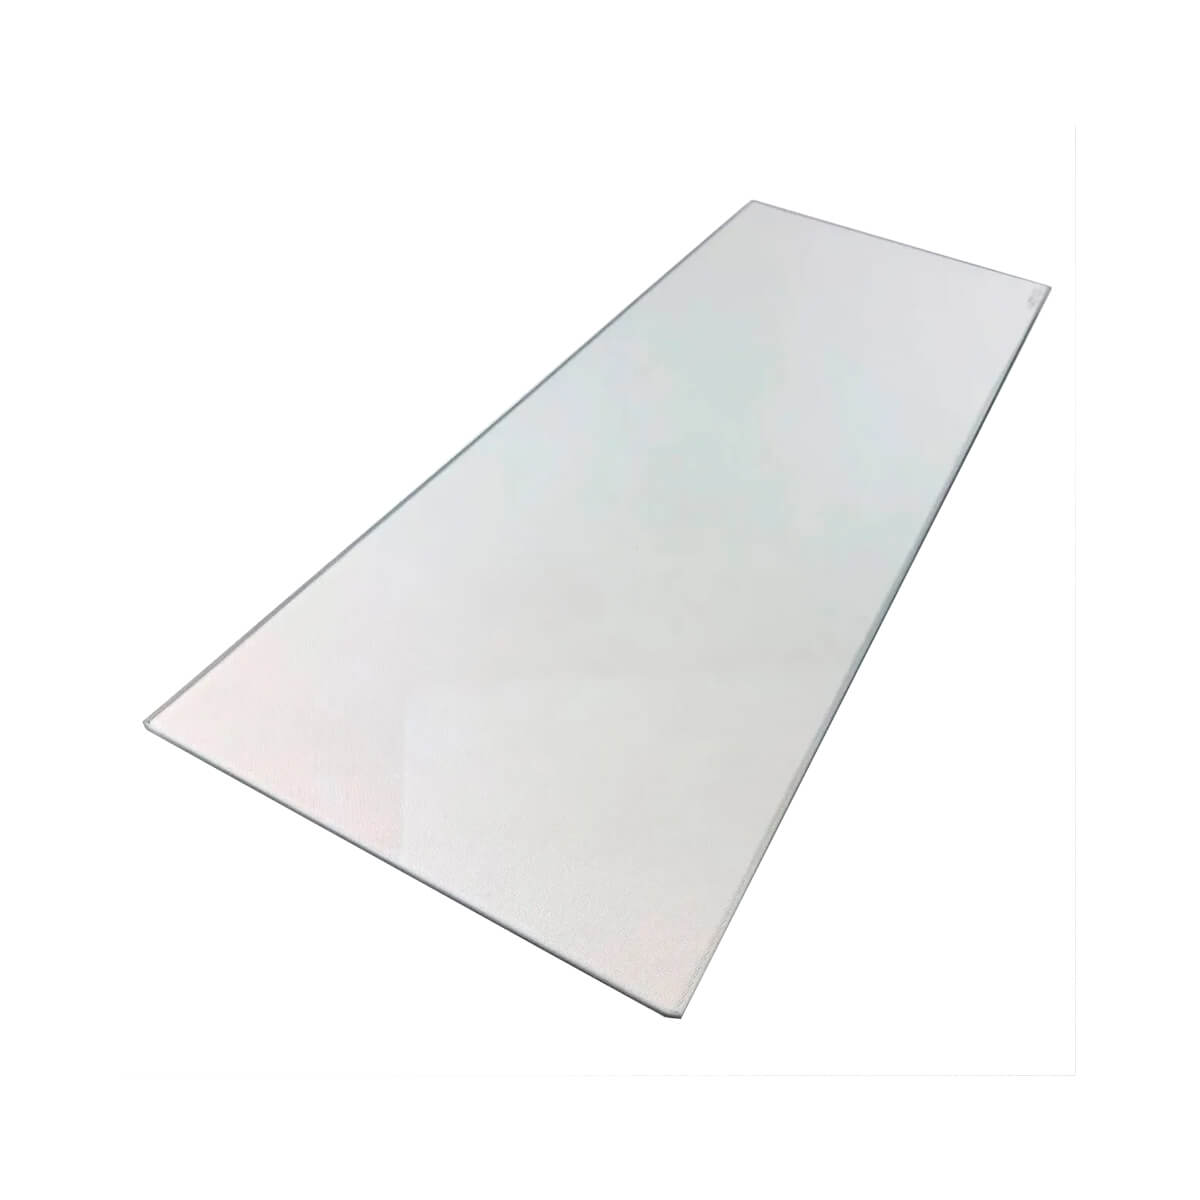 Vidro Da Prateleira Do Freezer Para Refrigerador DB53 DB52 DT52X IB53 IB52 Electrolux - 63000414